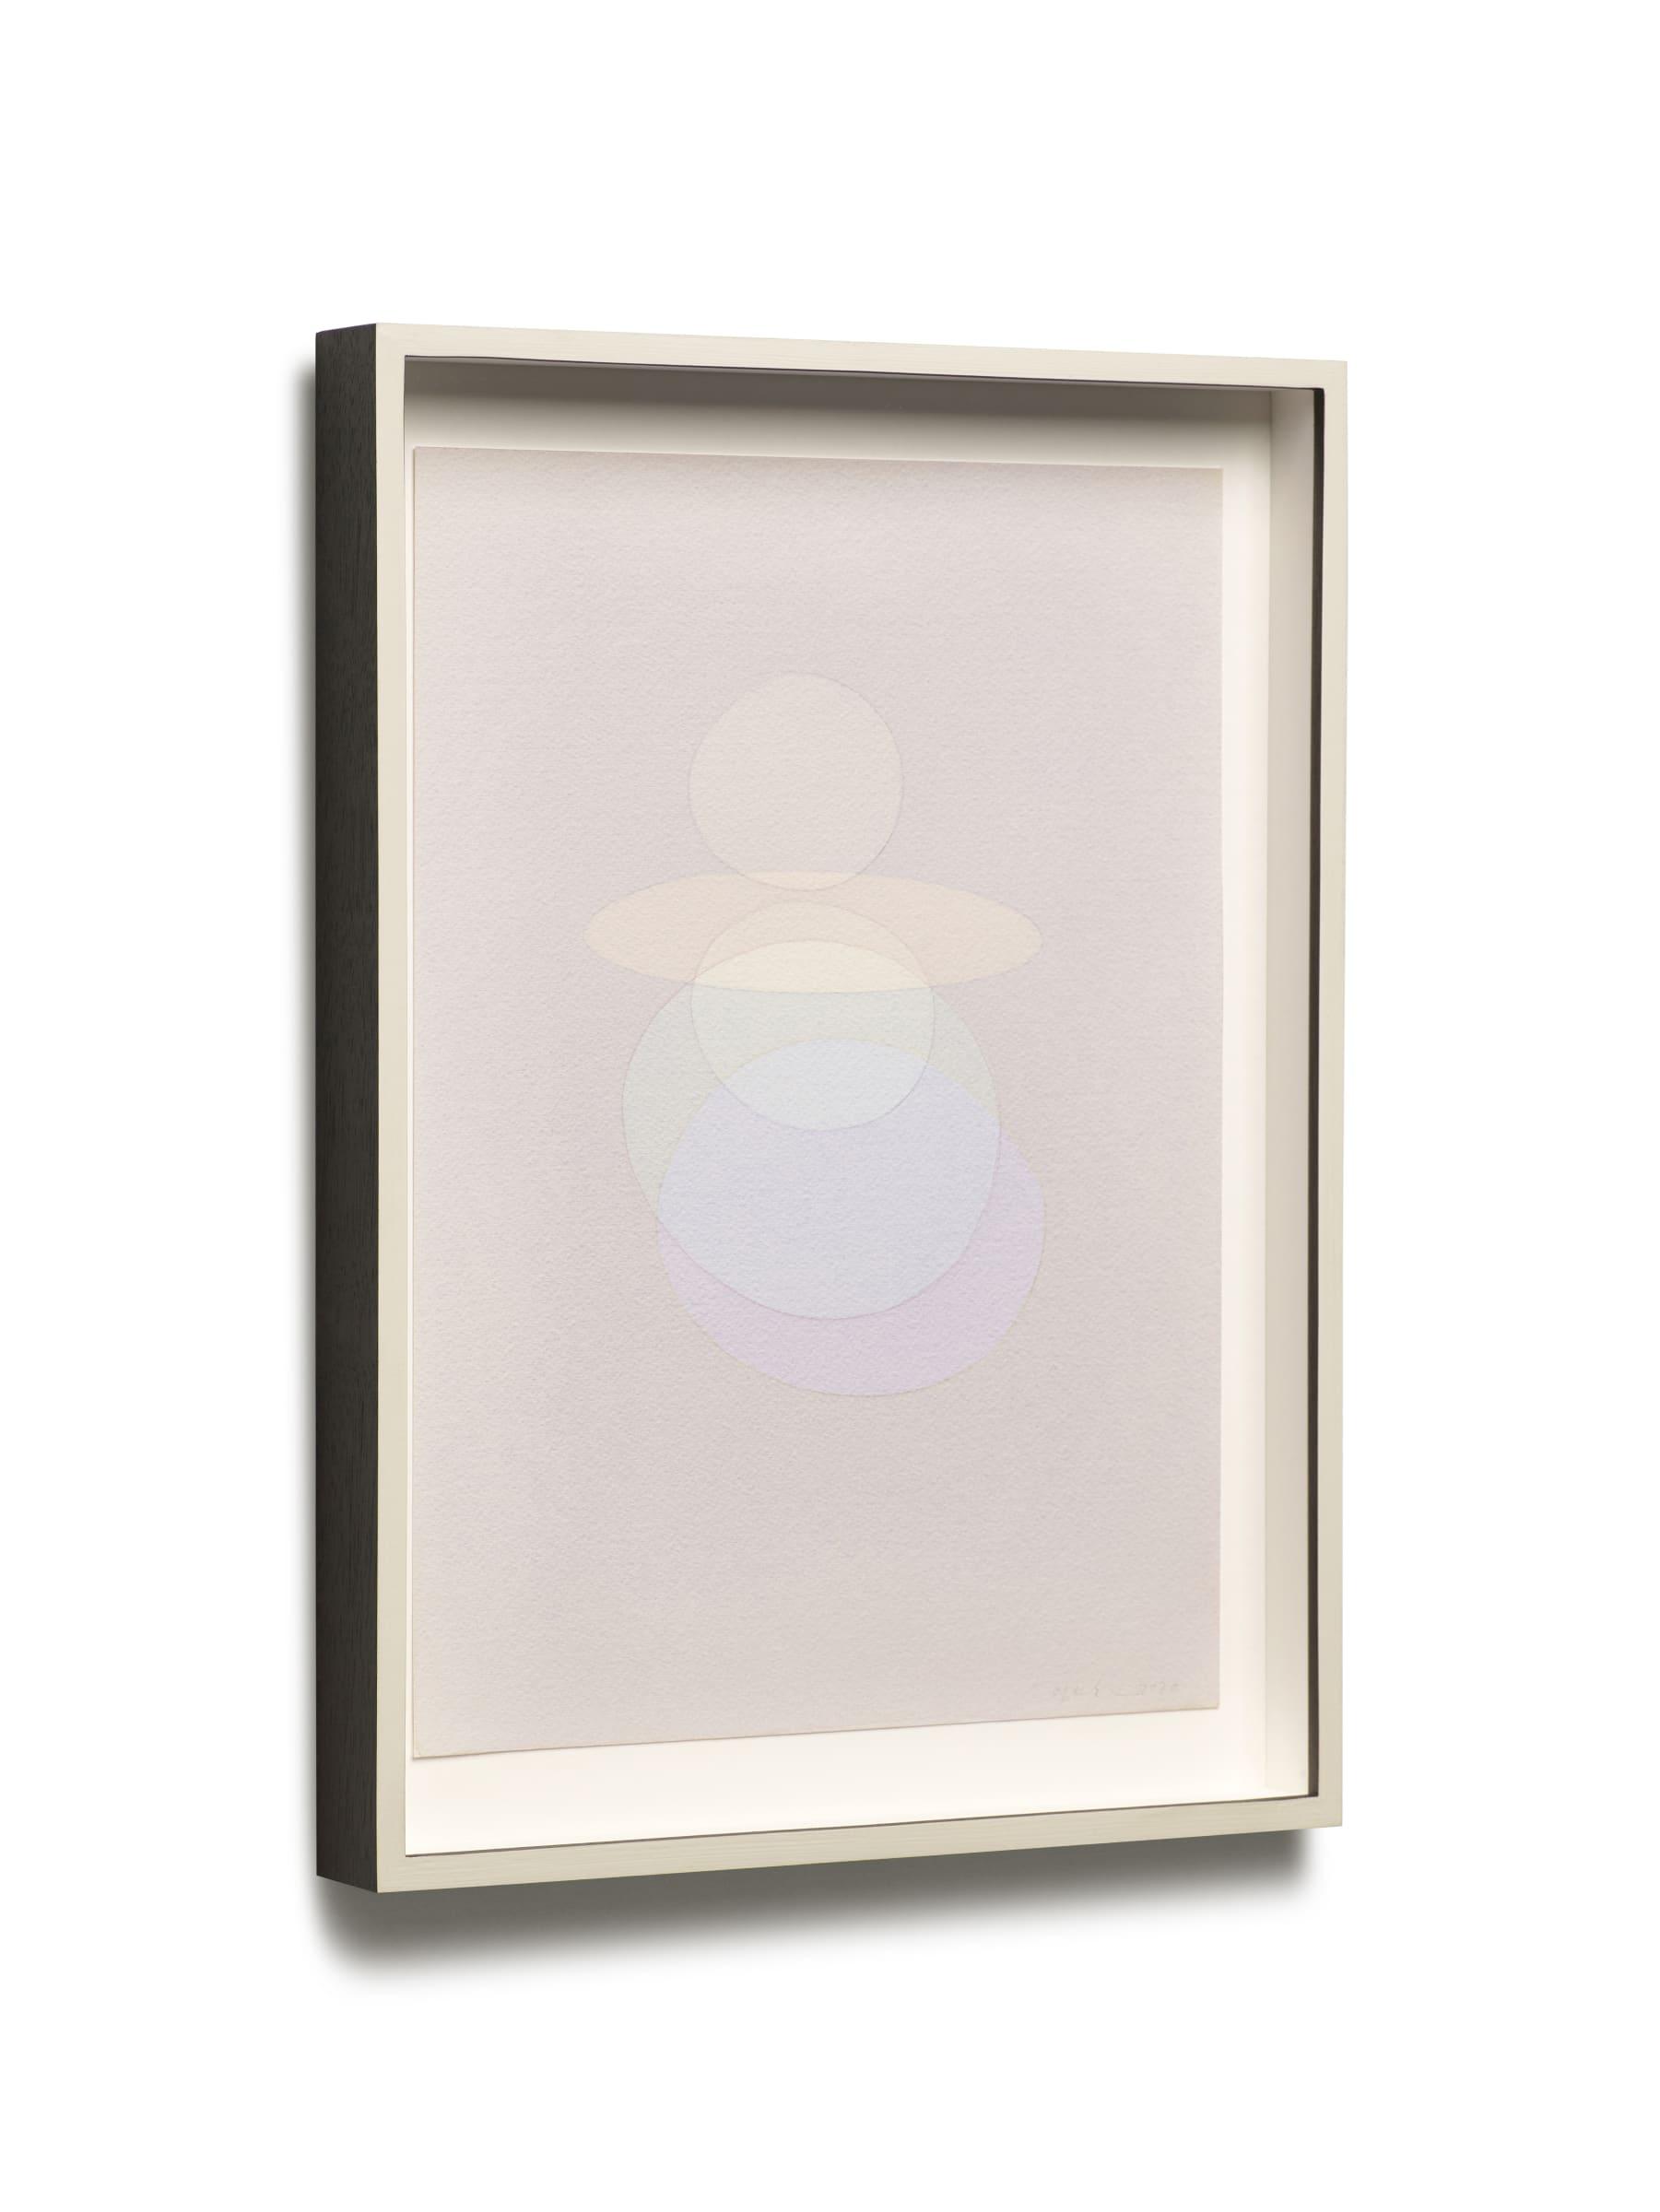 "<span class=""link fancybox-details-link""><a href=""/exhibitions/176/works/artworks16827/"">View Detail Page</a></span><div class=""artist""><strong>ÓLAFUR ELÍASSON</strong></div><div class=""title""><em>Circular hand dance voids (clarity)</em>, 2020</div><div class=""medium"">watercolour, pencil on paper</div><div class=""dimensions"">39,8 x 28,8 x 4 cm</div>"